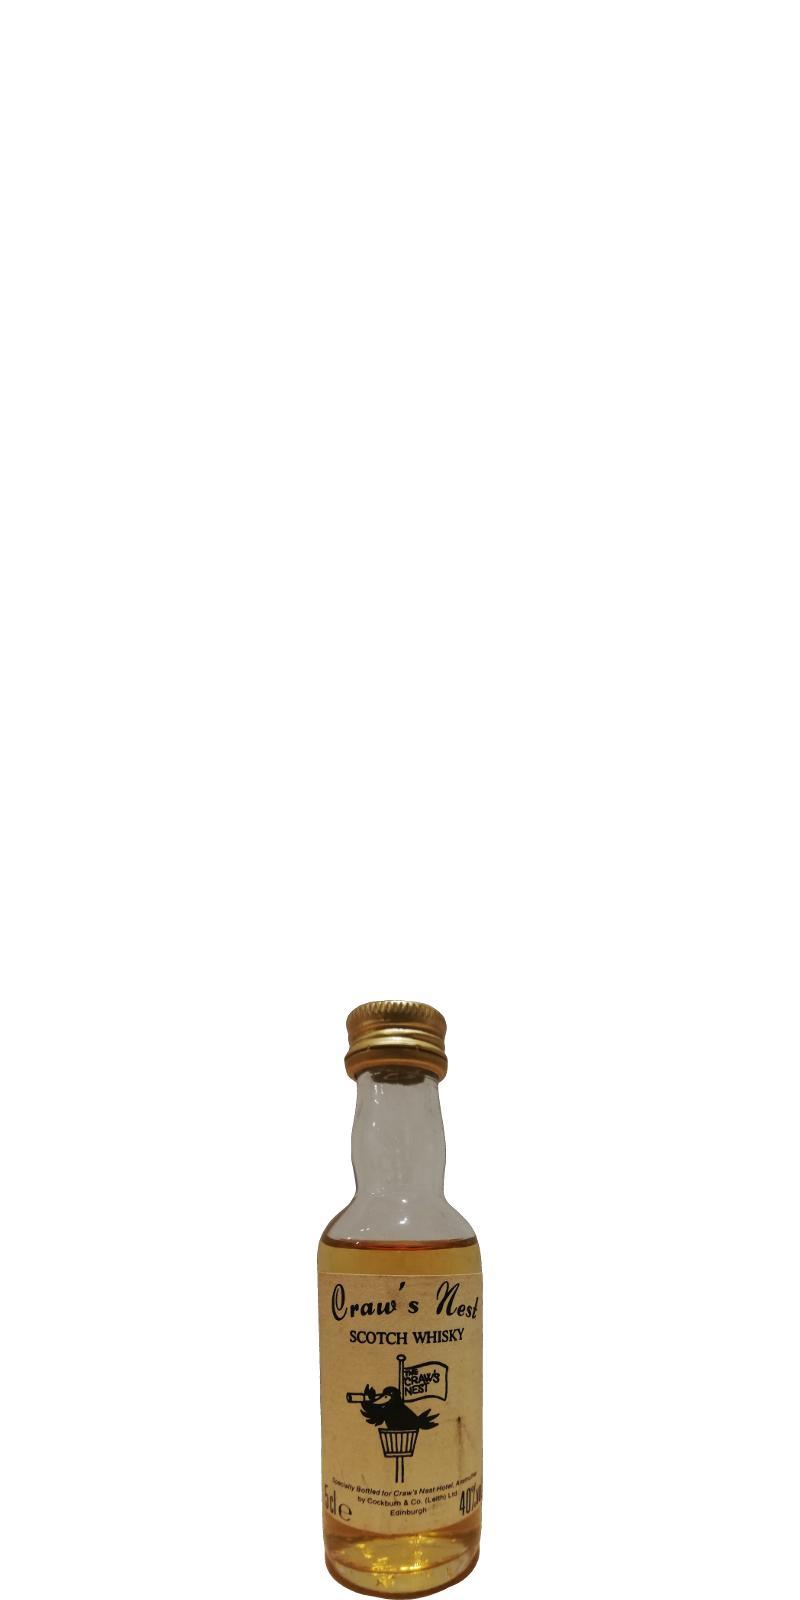 Craw's Nest Scotch Whisky